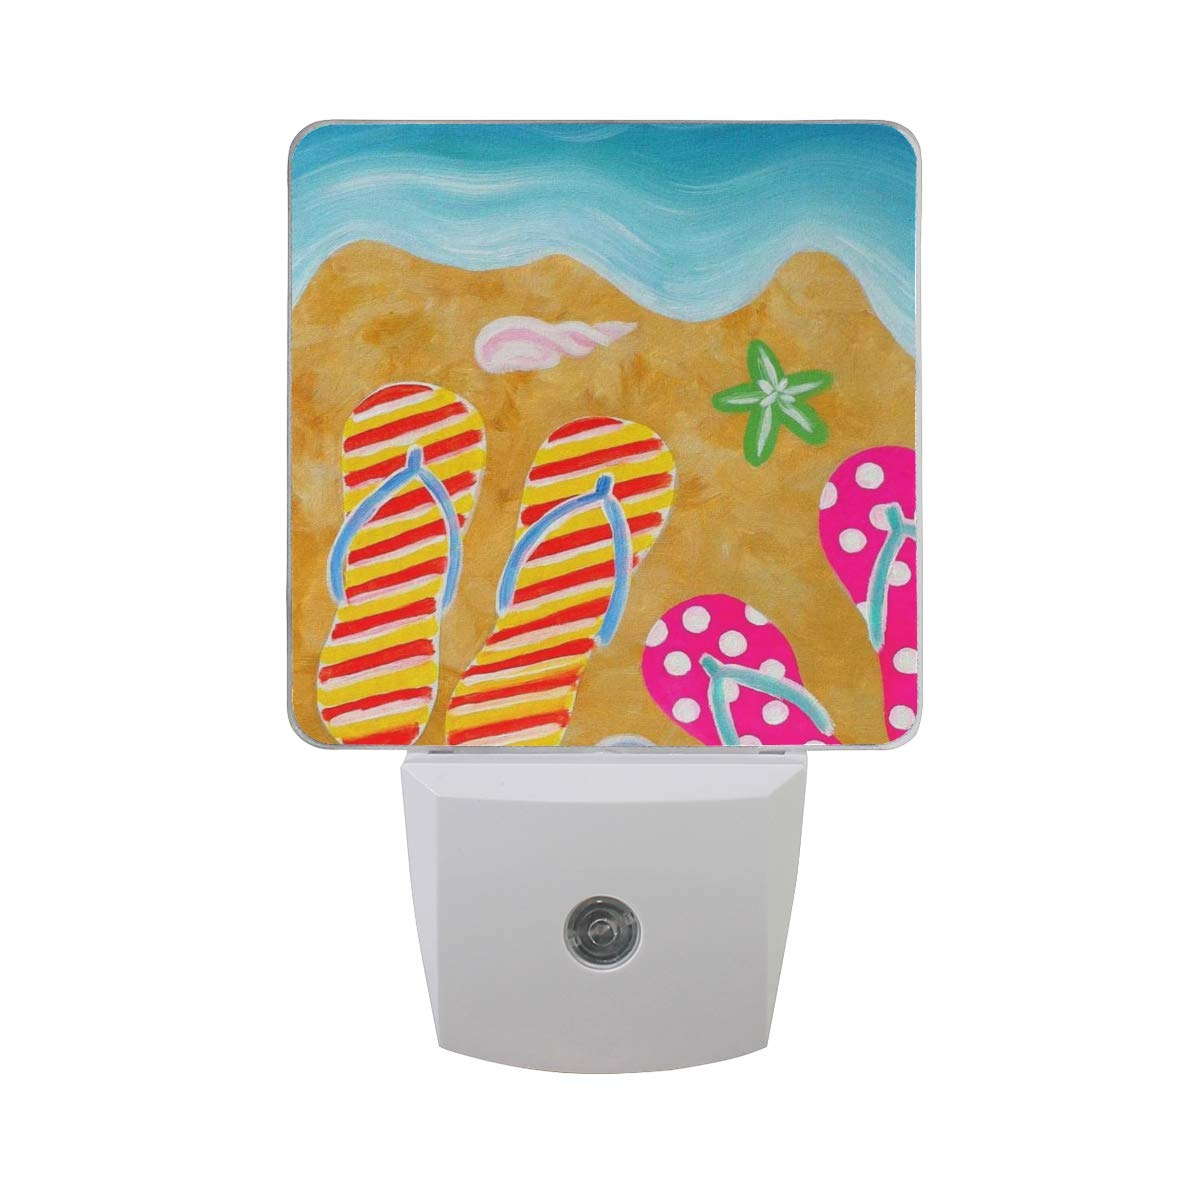 Night Light Summer Flip Flops Sun Led Light Lamp for Hallway, Kitchen, Bathroom, Bedroom, Stairs, DaylightWhite, Bedroom, Compact